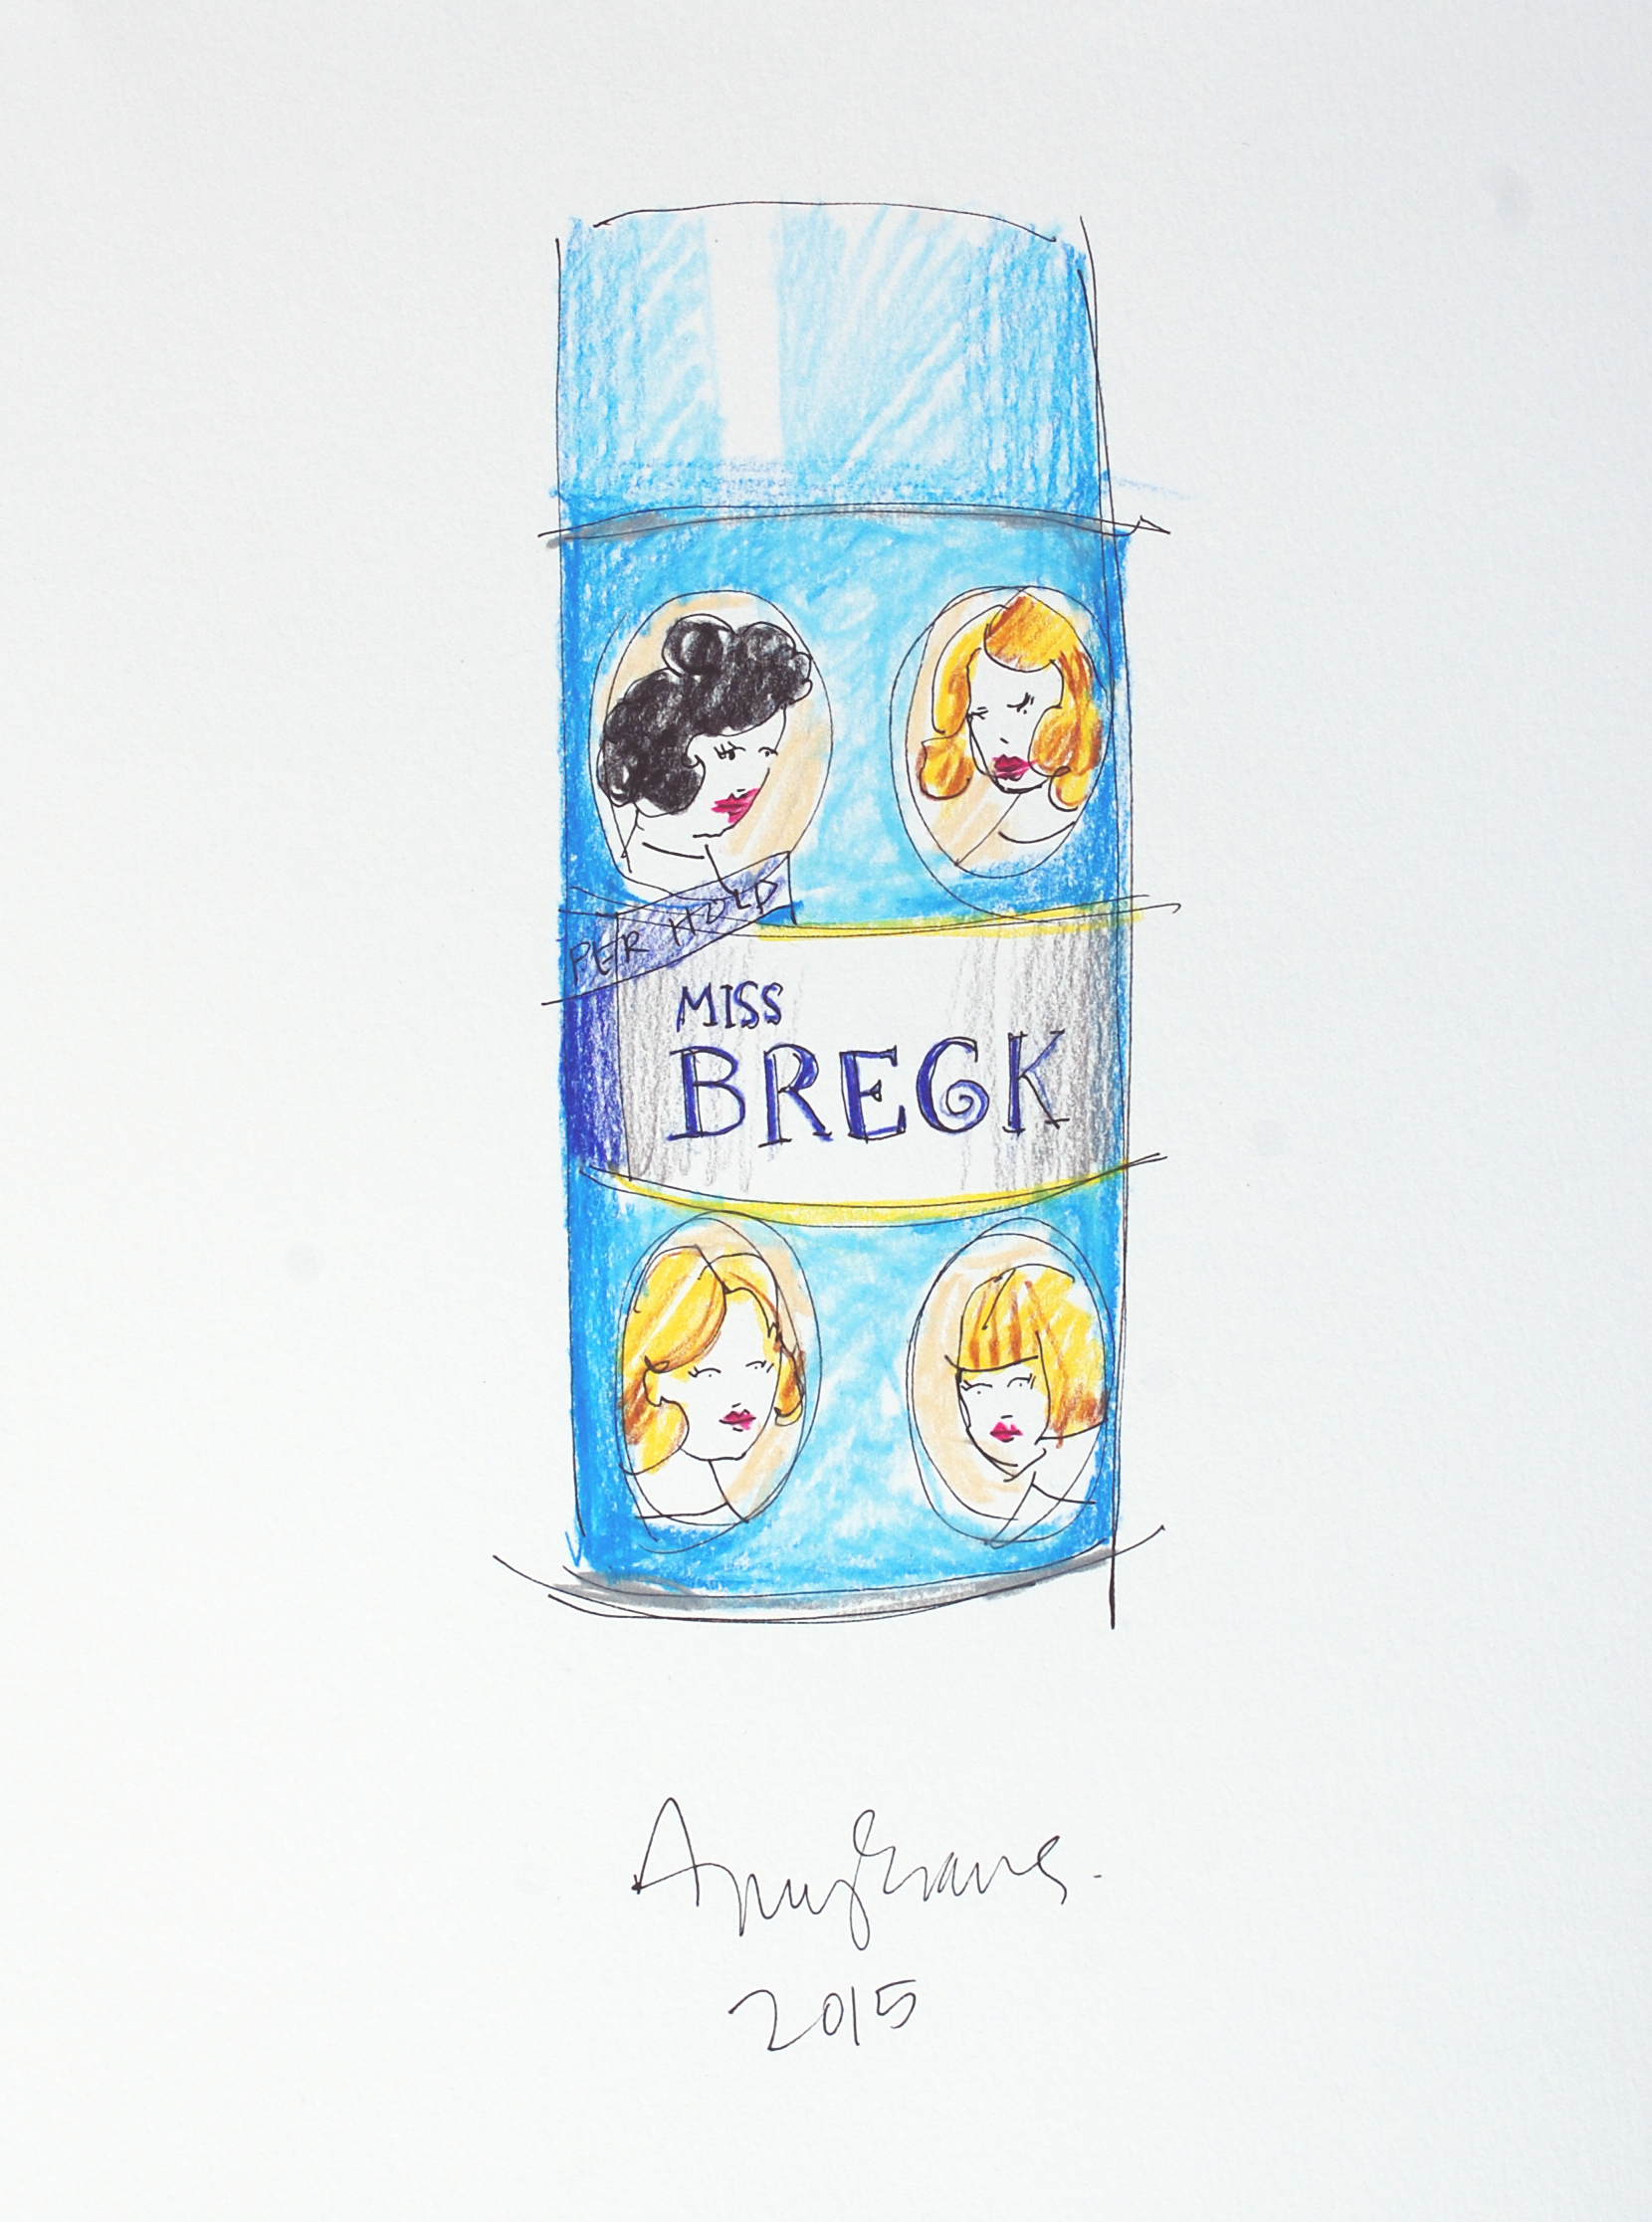 MISS BRECK